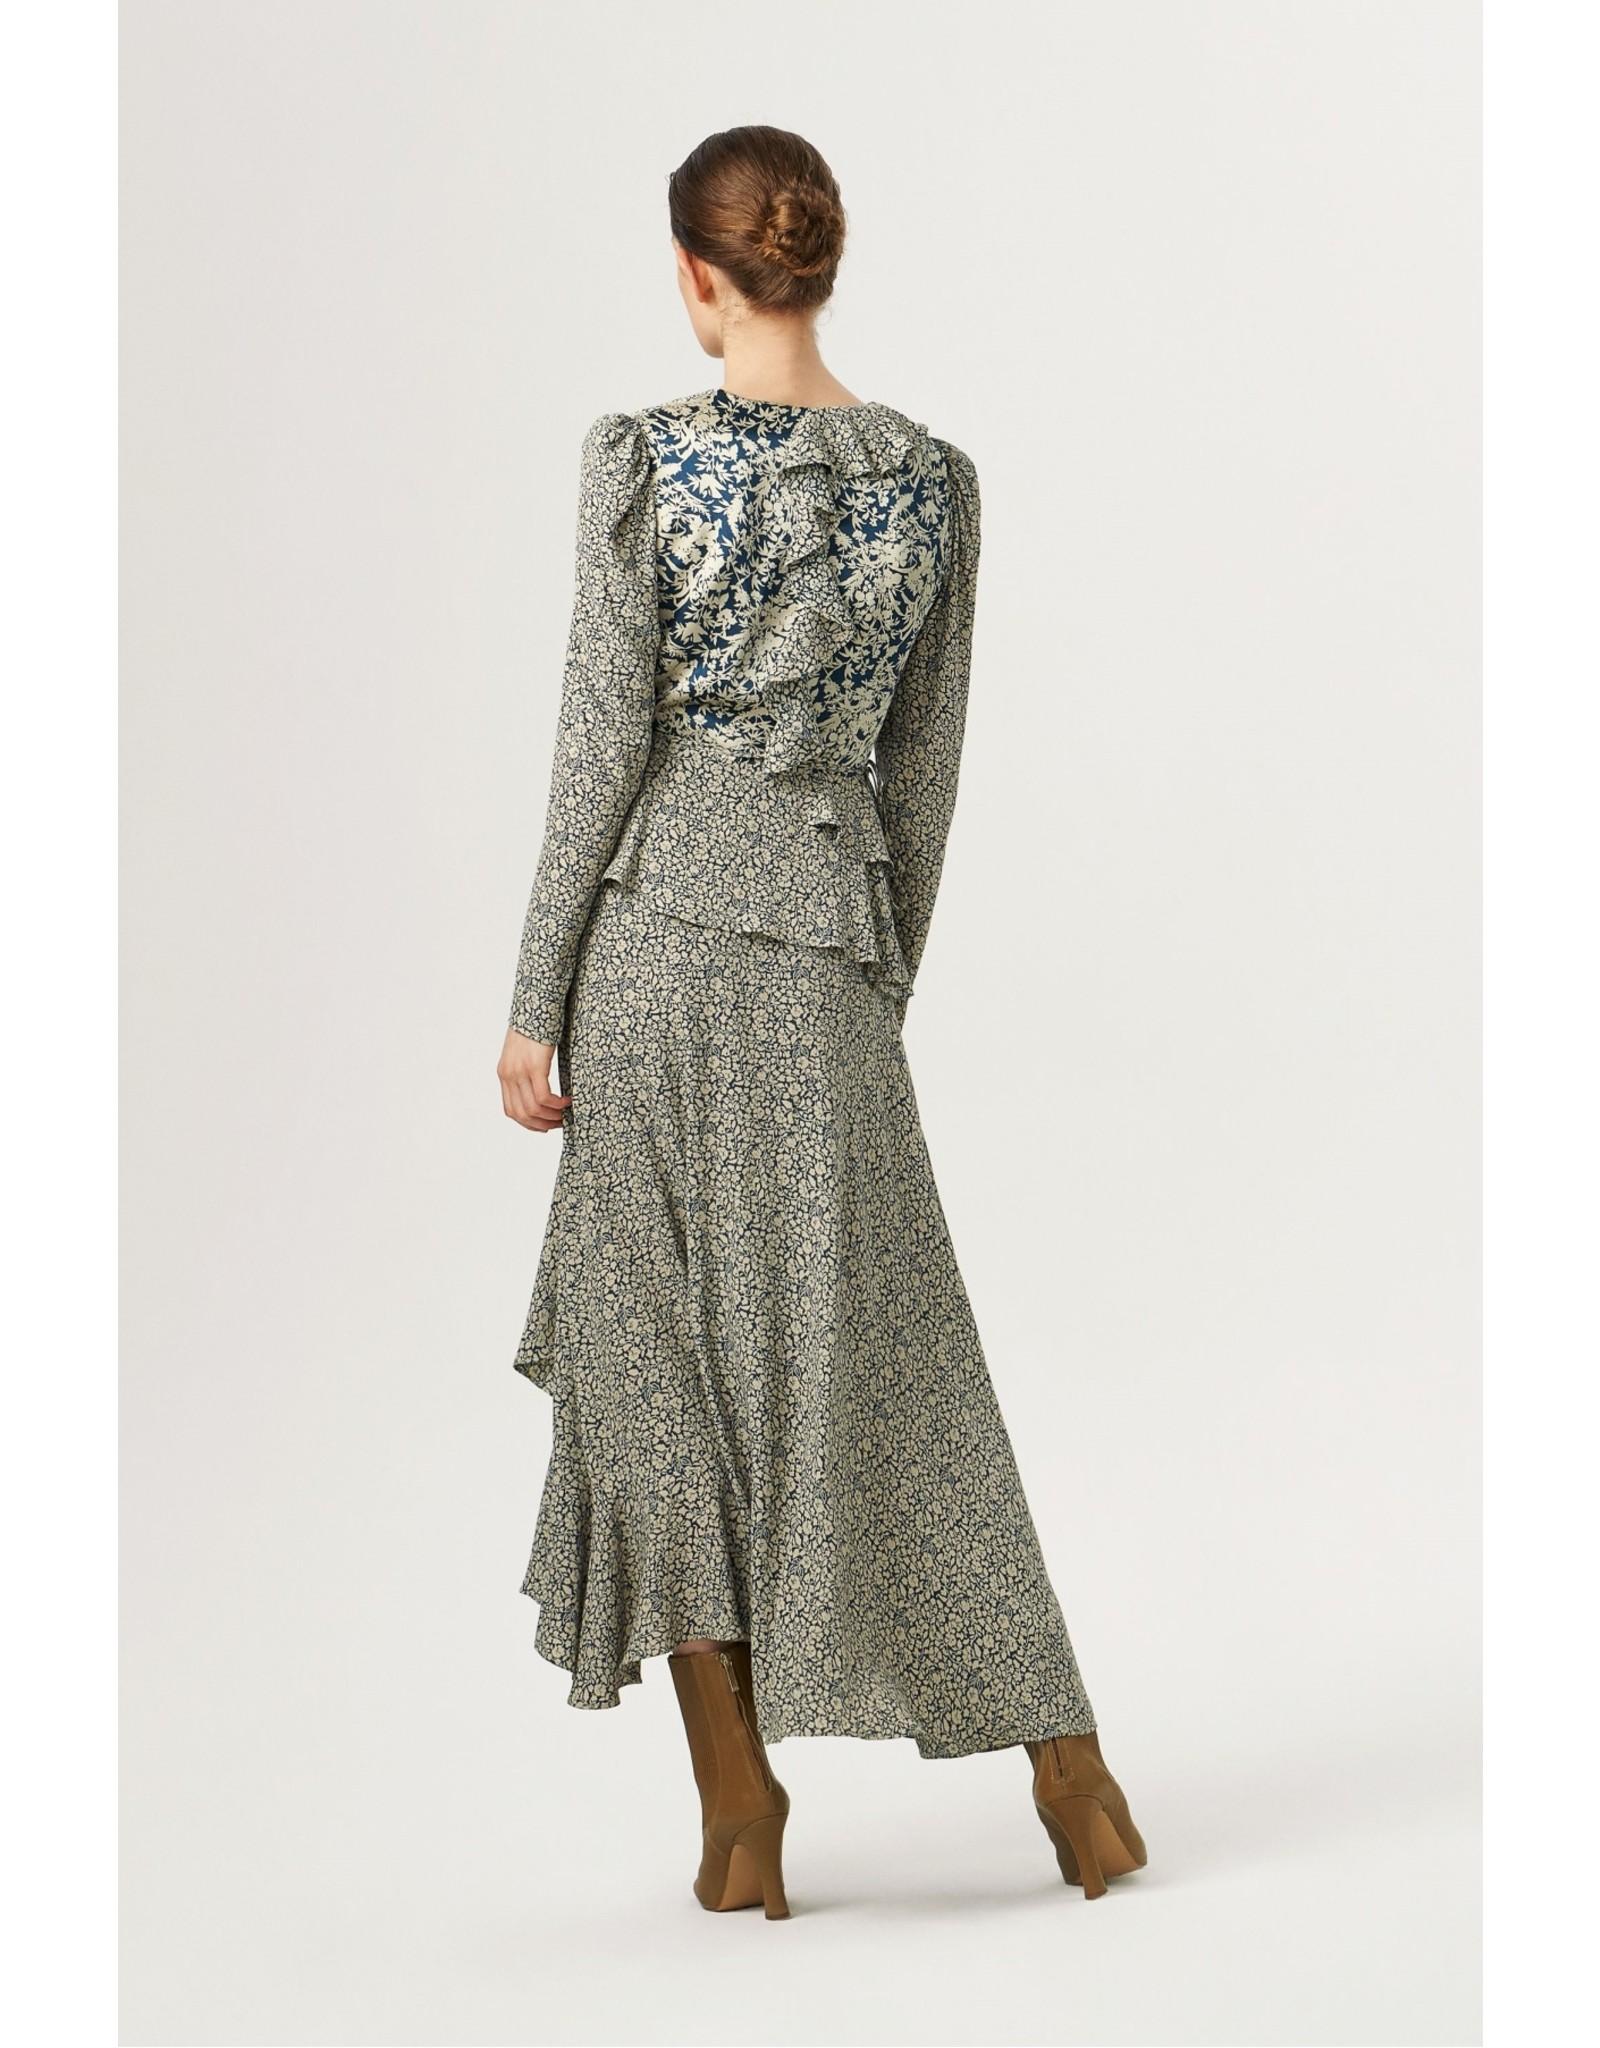 Exquise Ruffled Neck Layered Navy Dress